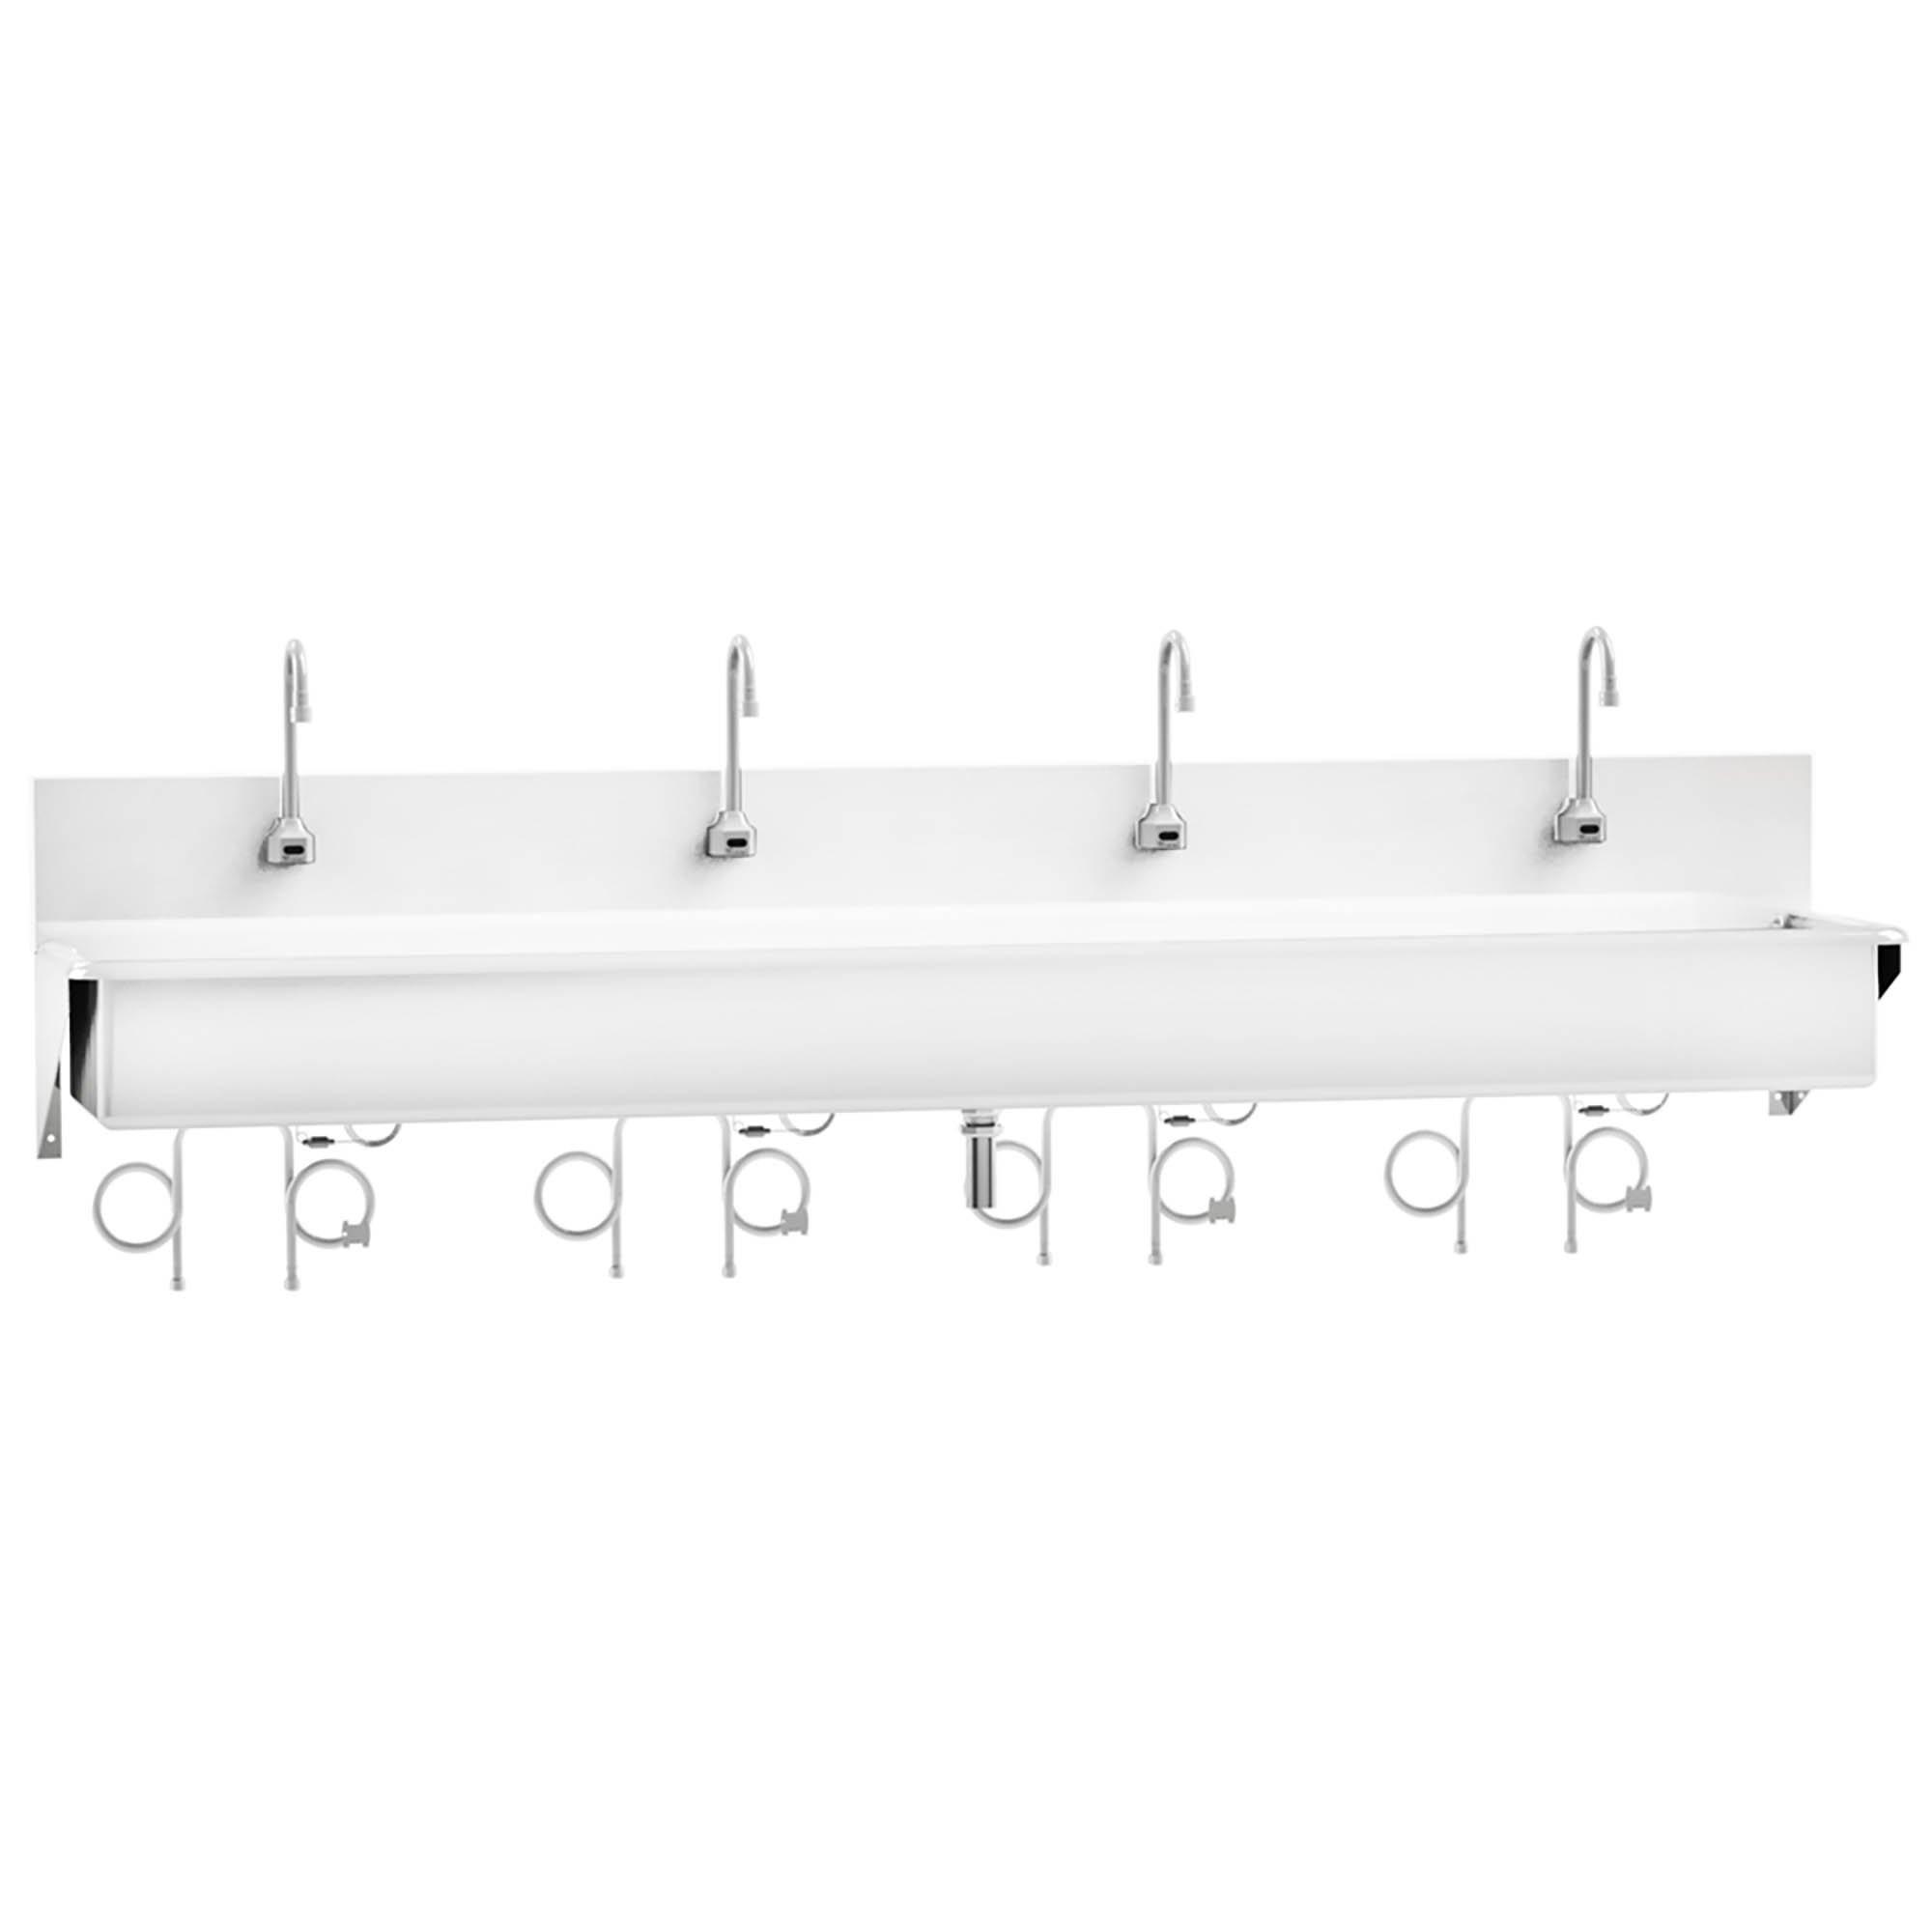 Windsor Scrub Sink - Four-Place Infrared Sensor Control - 91